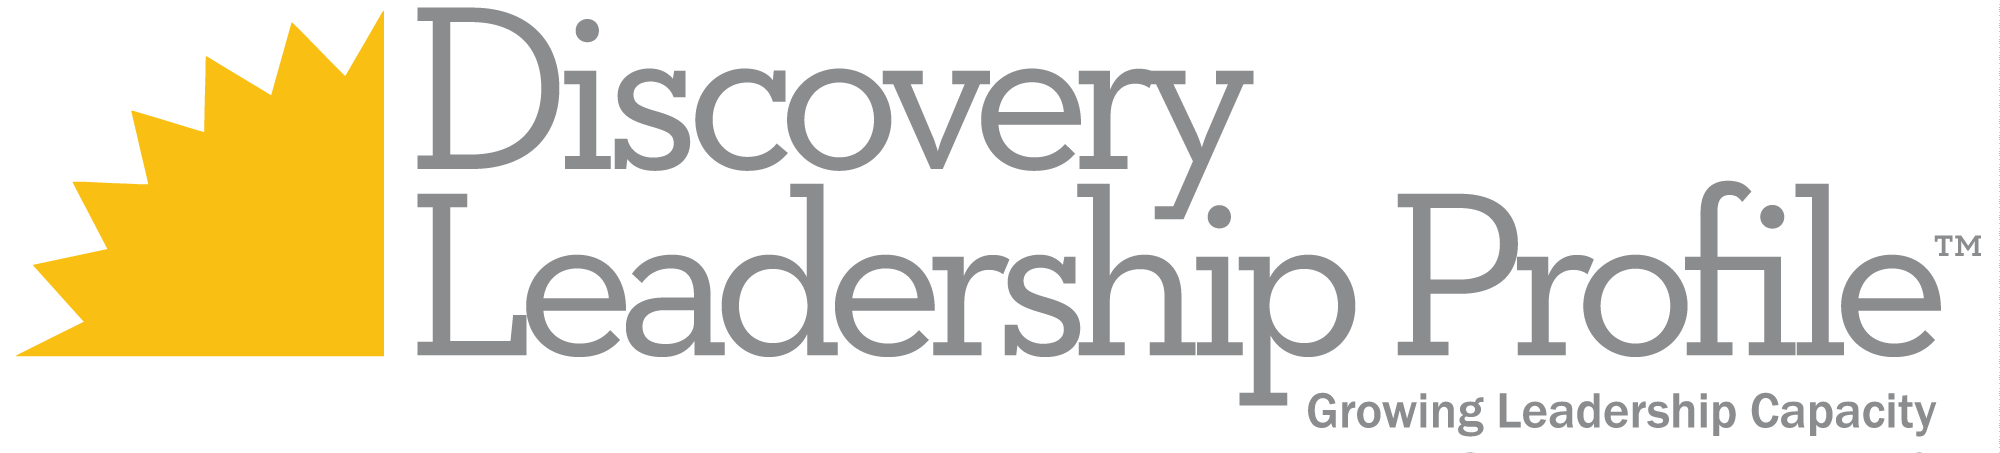 Discovery-Leadership-Profile1